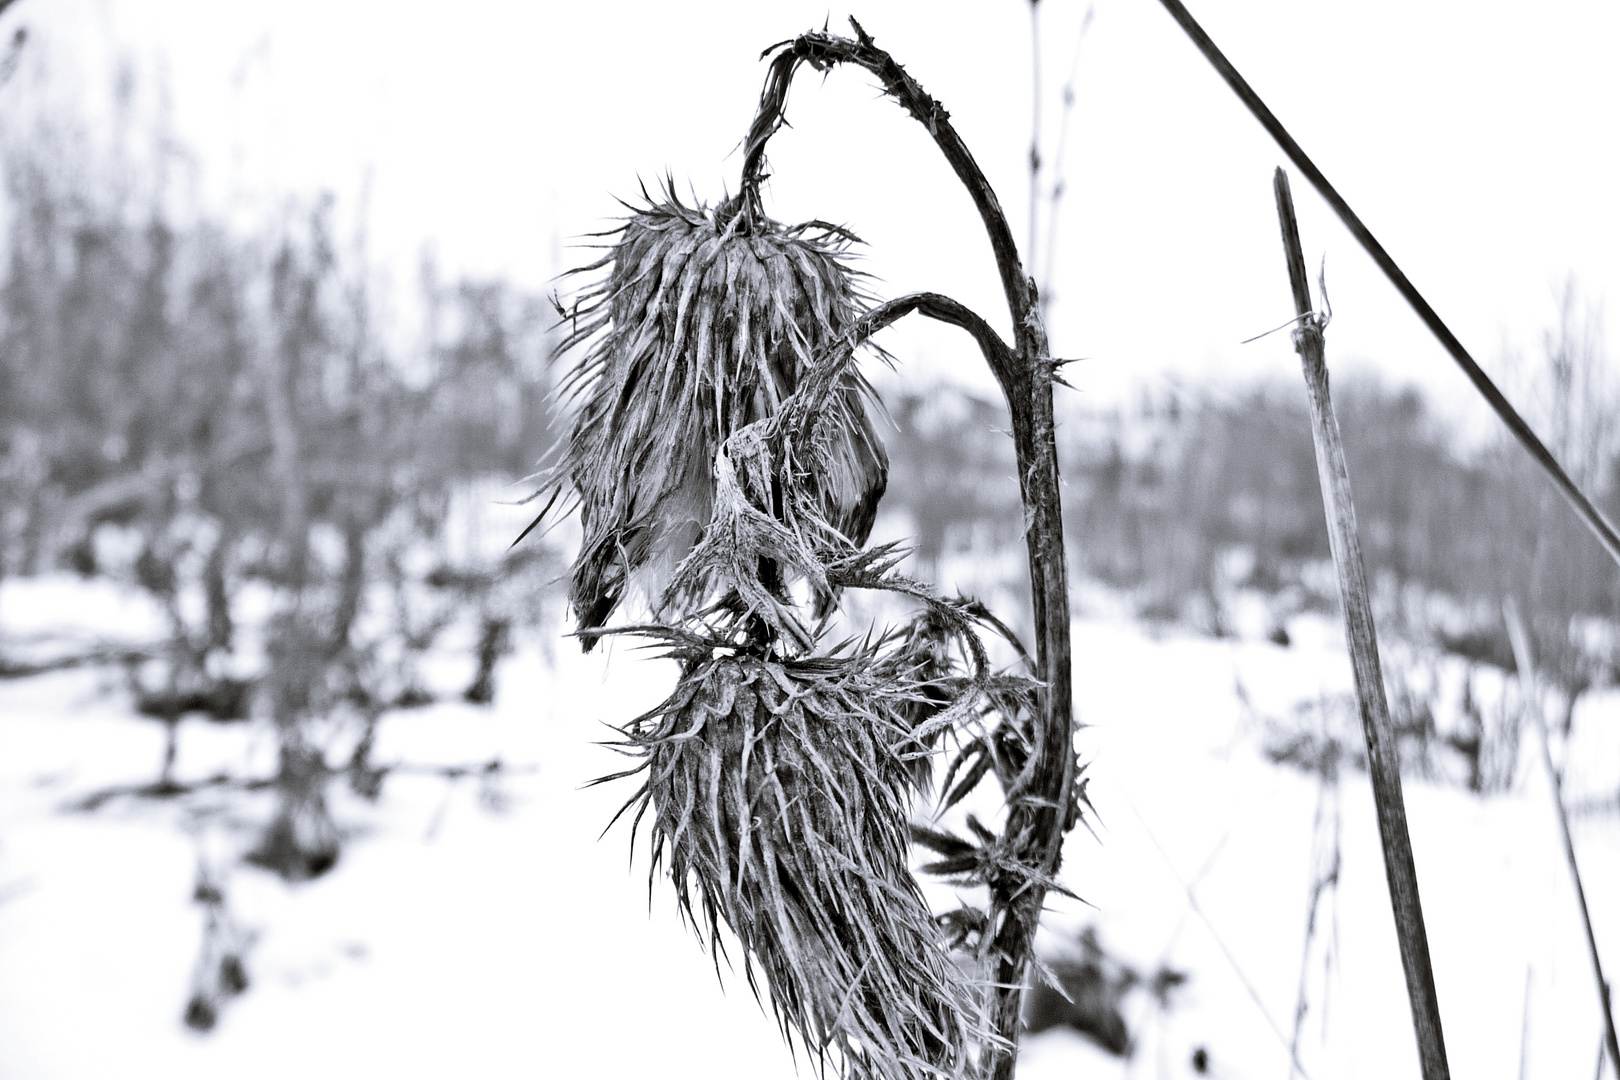 a last winter impression